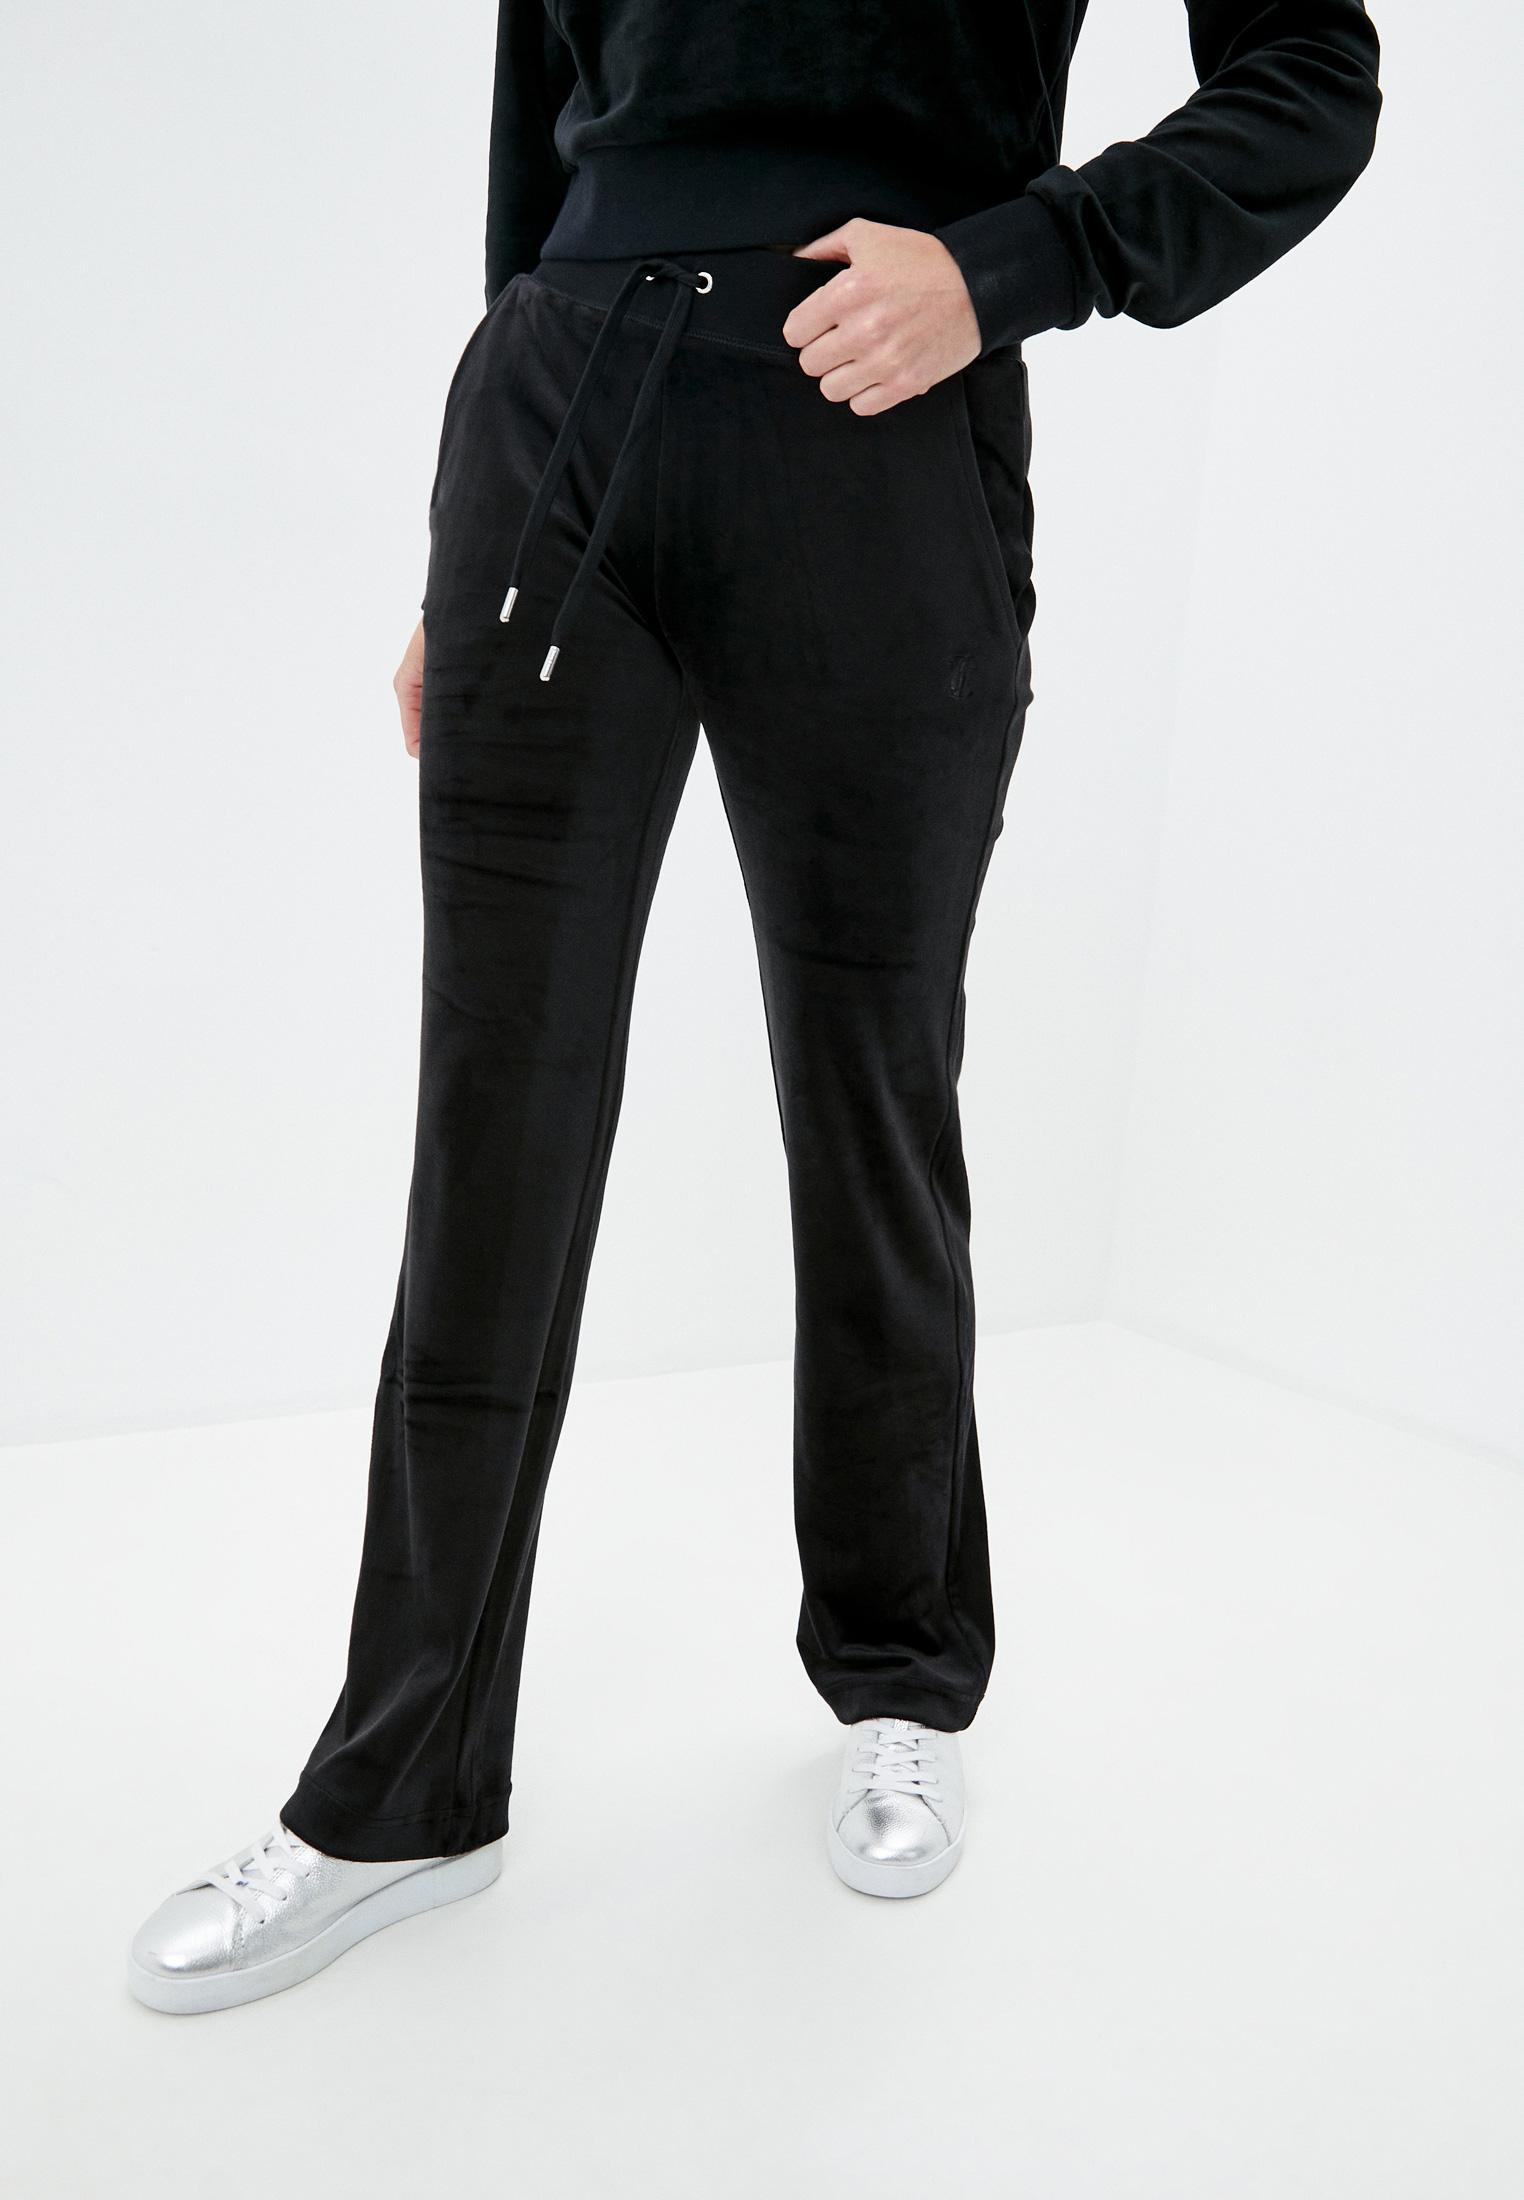 Женские спортивные брюки Juicy Couture (Джуси Кутюр) JCAP177